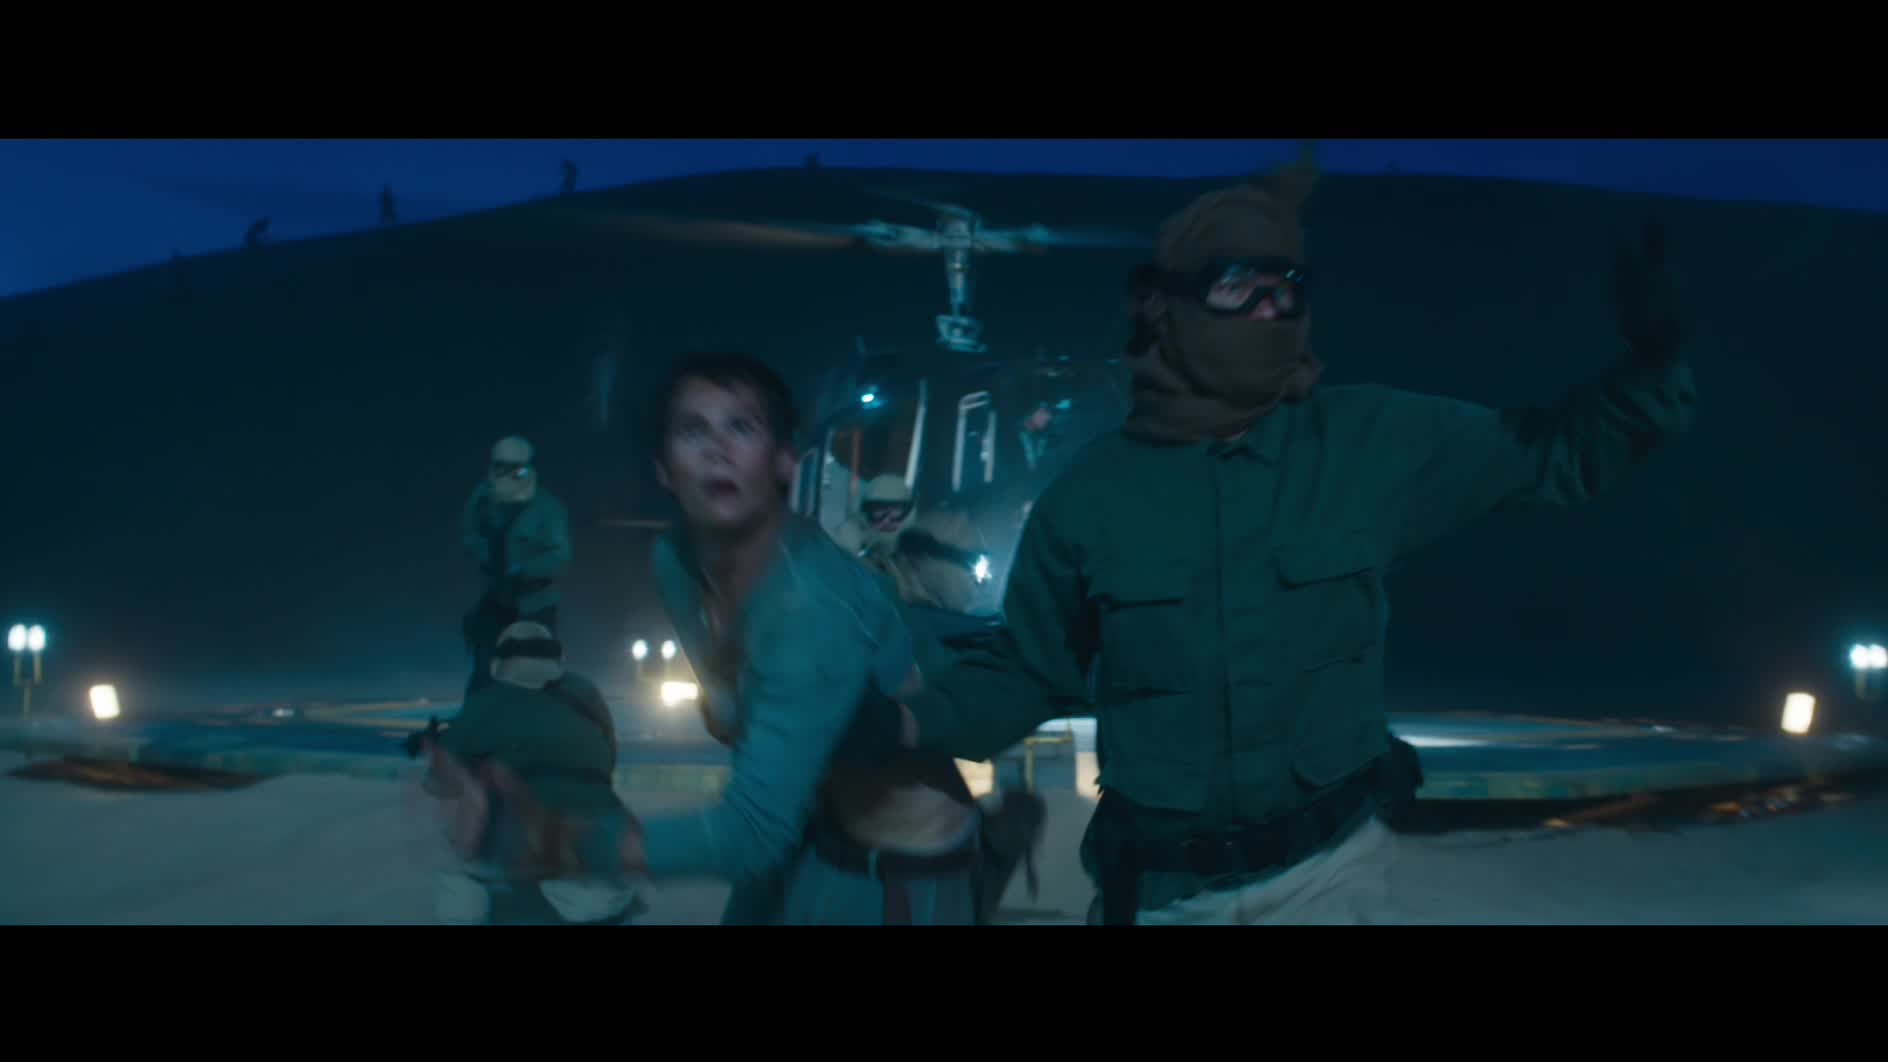 Maze Runner - La fuga hd full movie download